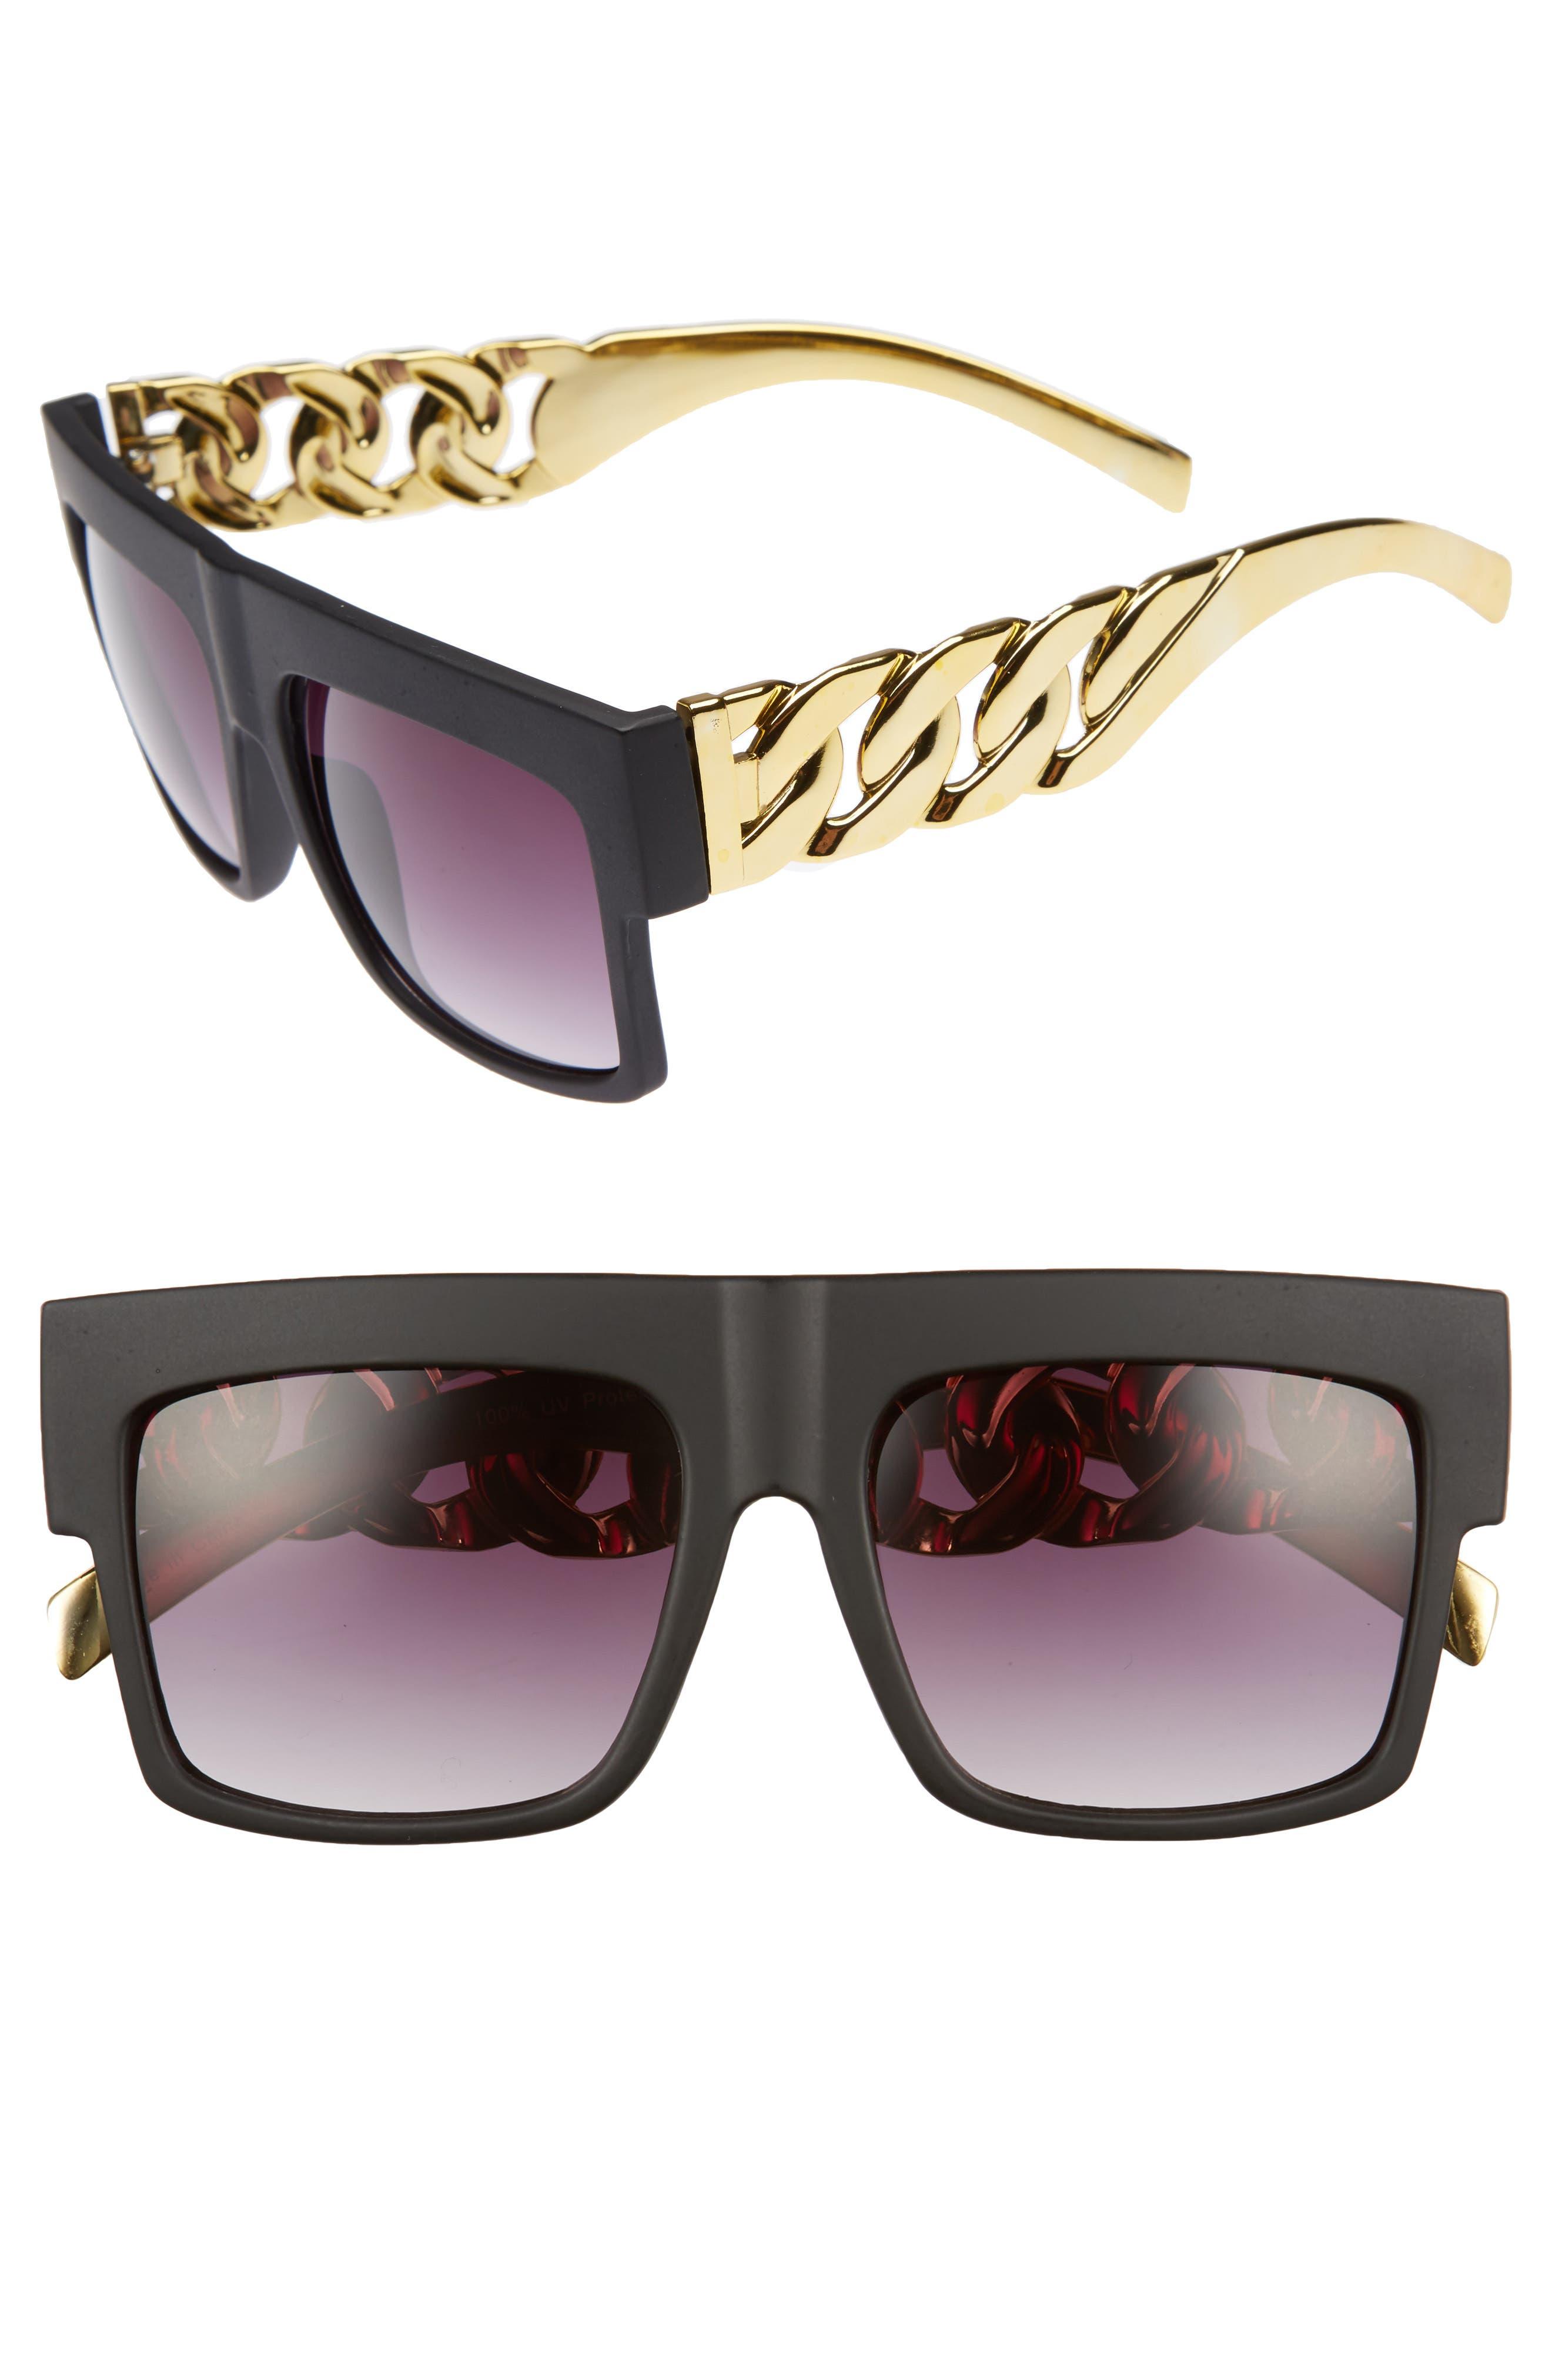 52mm Chain Detail Shield Sunglasses,                         Main,                         color, 001